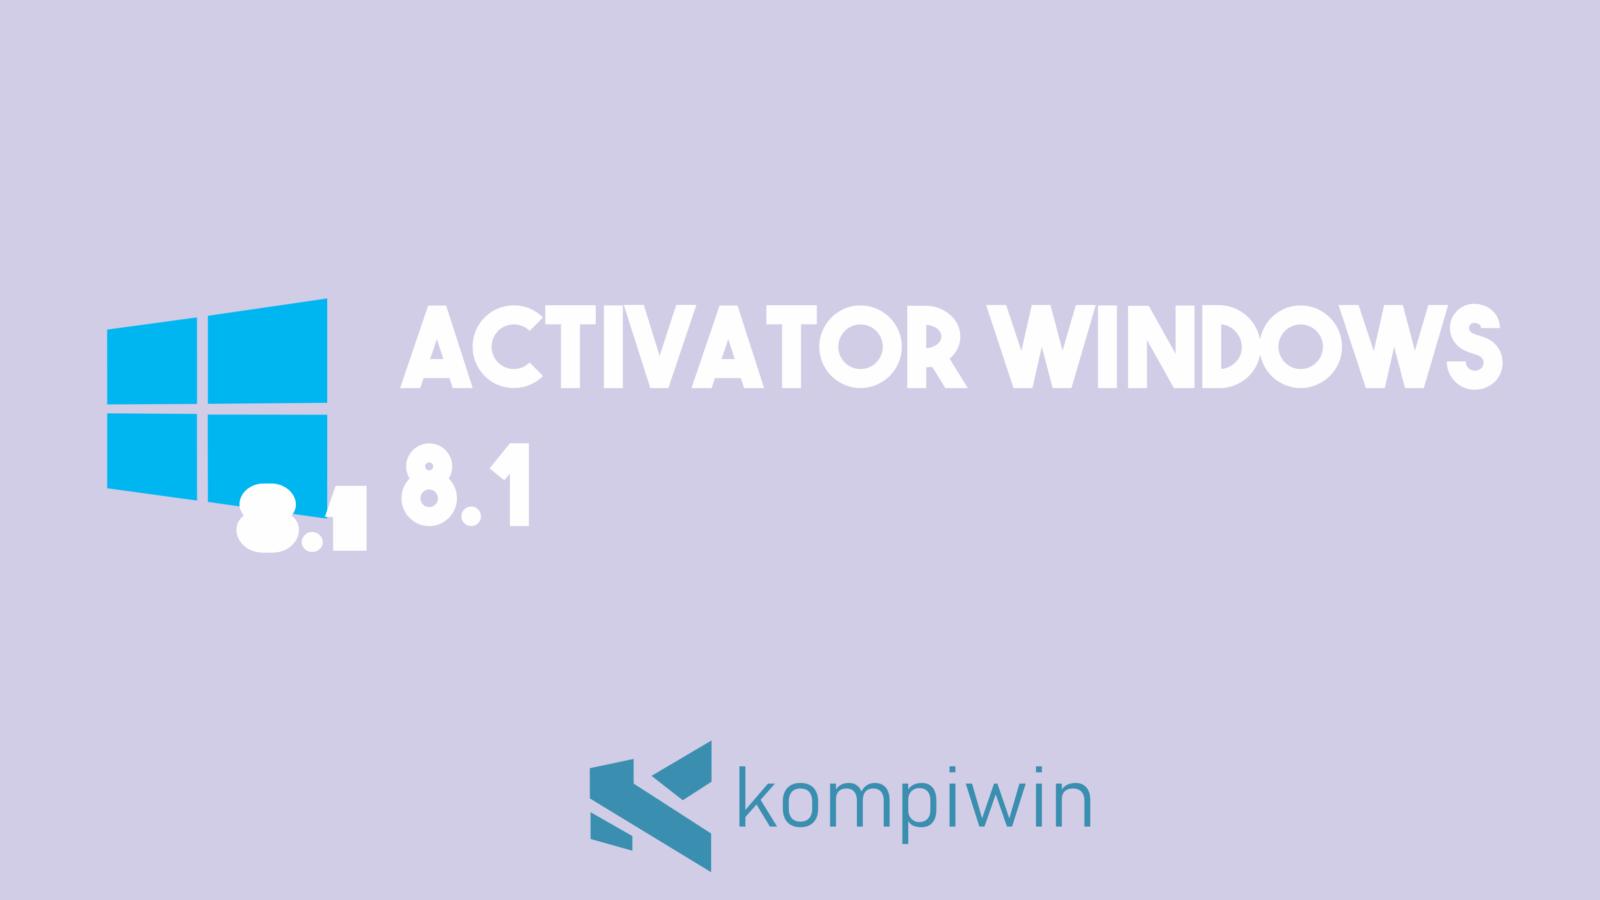 Activator Windows 8.1 7